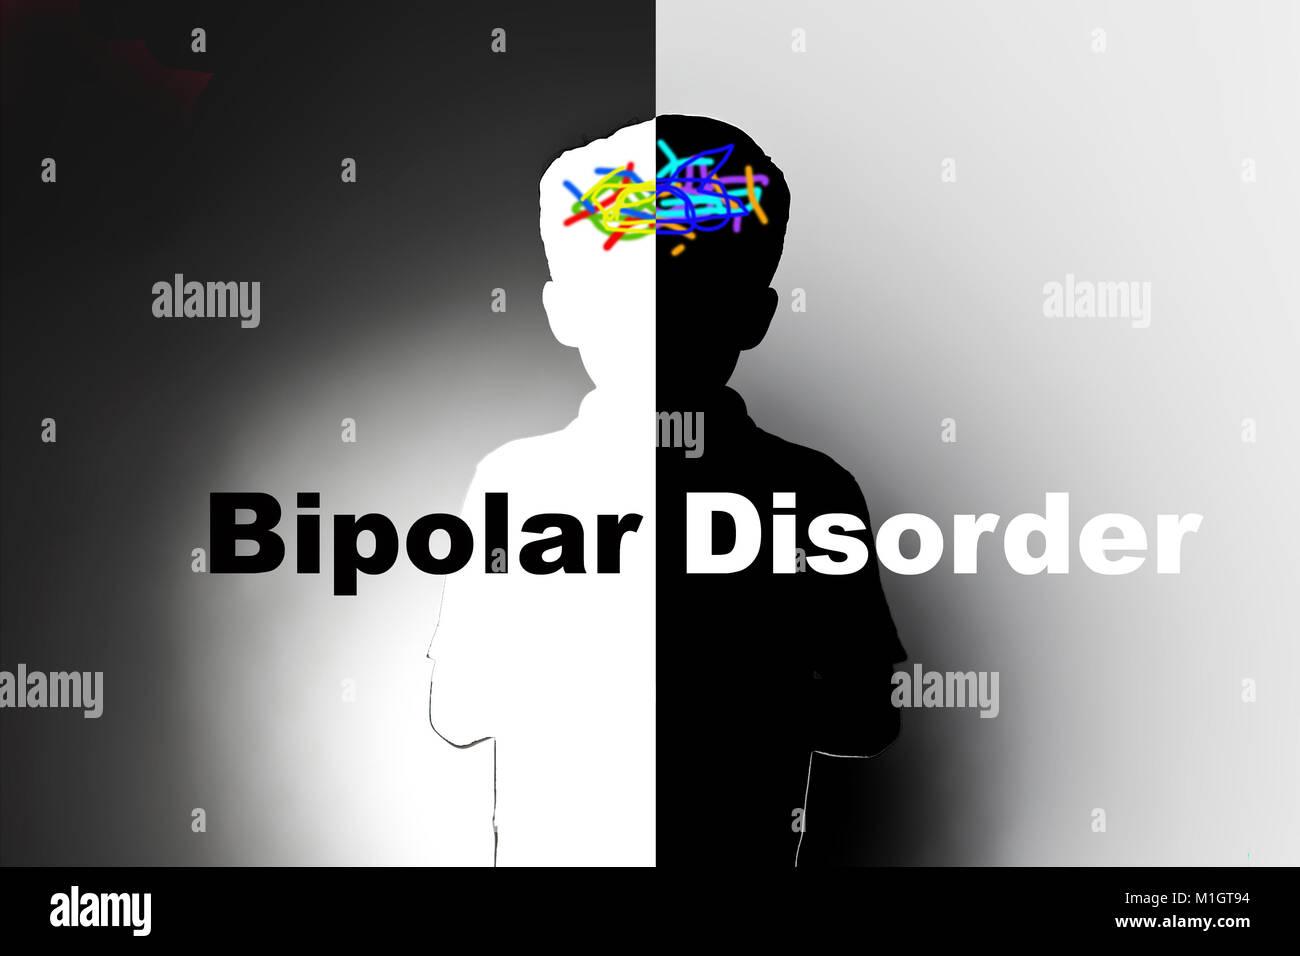 bipolar disorder, safeguarding children with mental illness - Stock Image